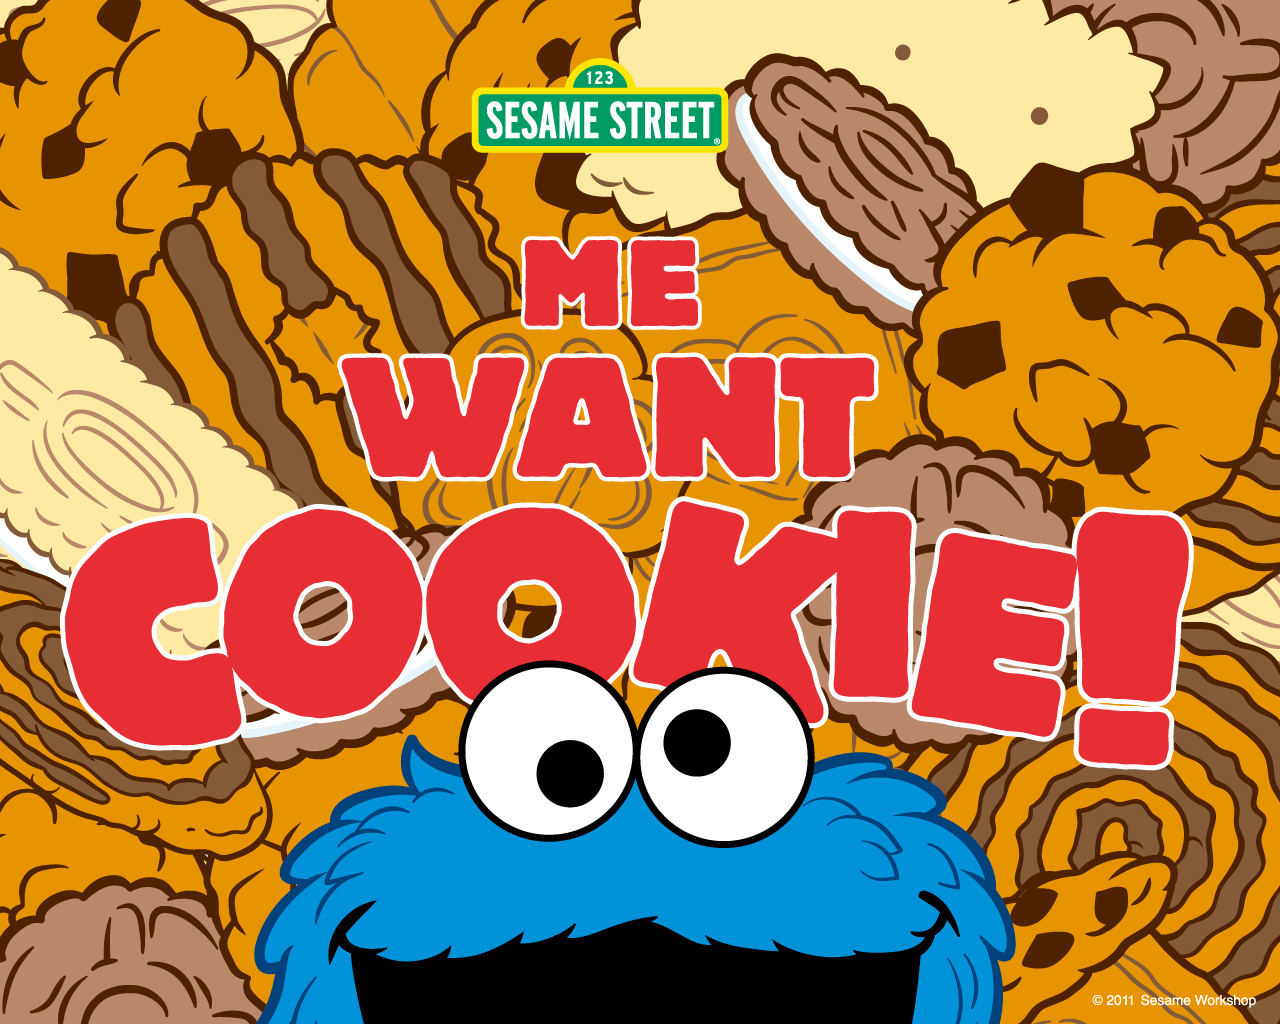 Sesame Street Cookie Monster 1280x1024